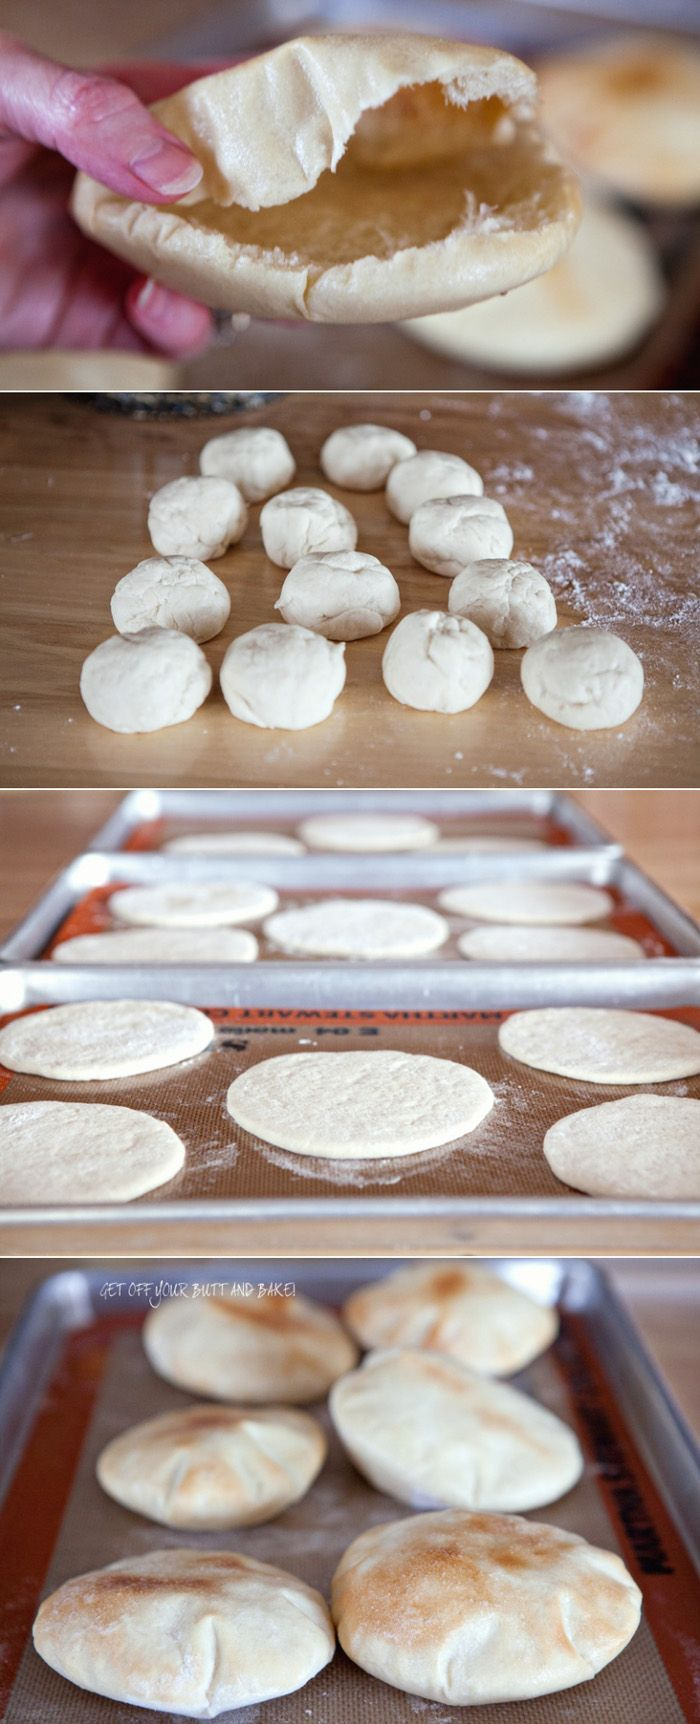 Easy Pita Bread Recette Recette Cuisine Et Boissons Et Nourriture